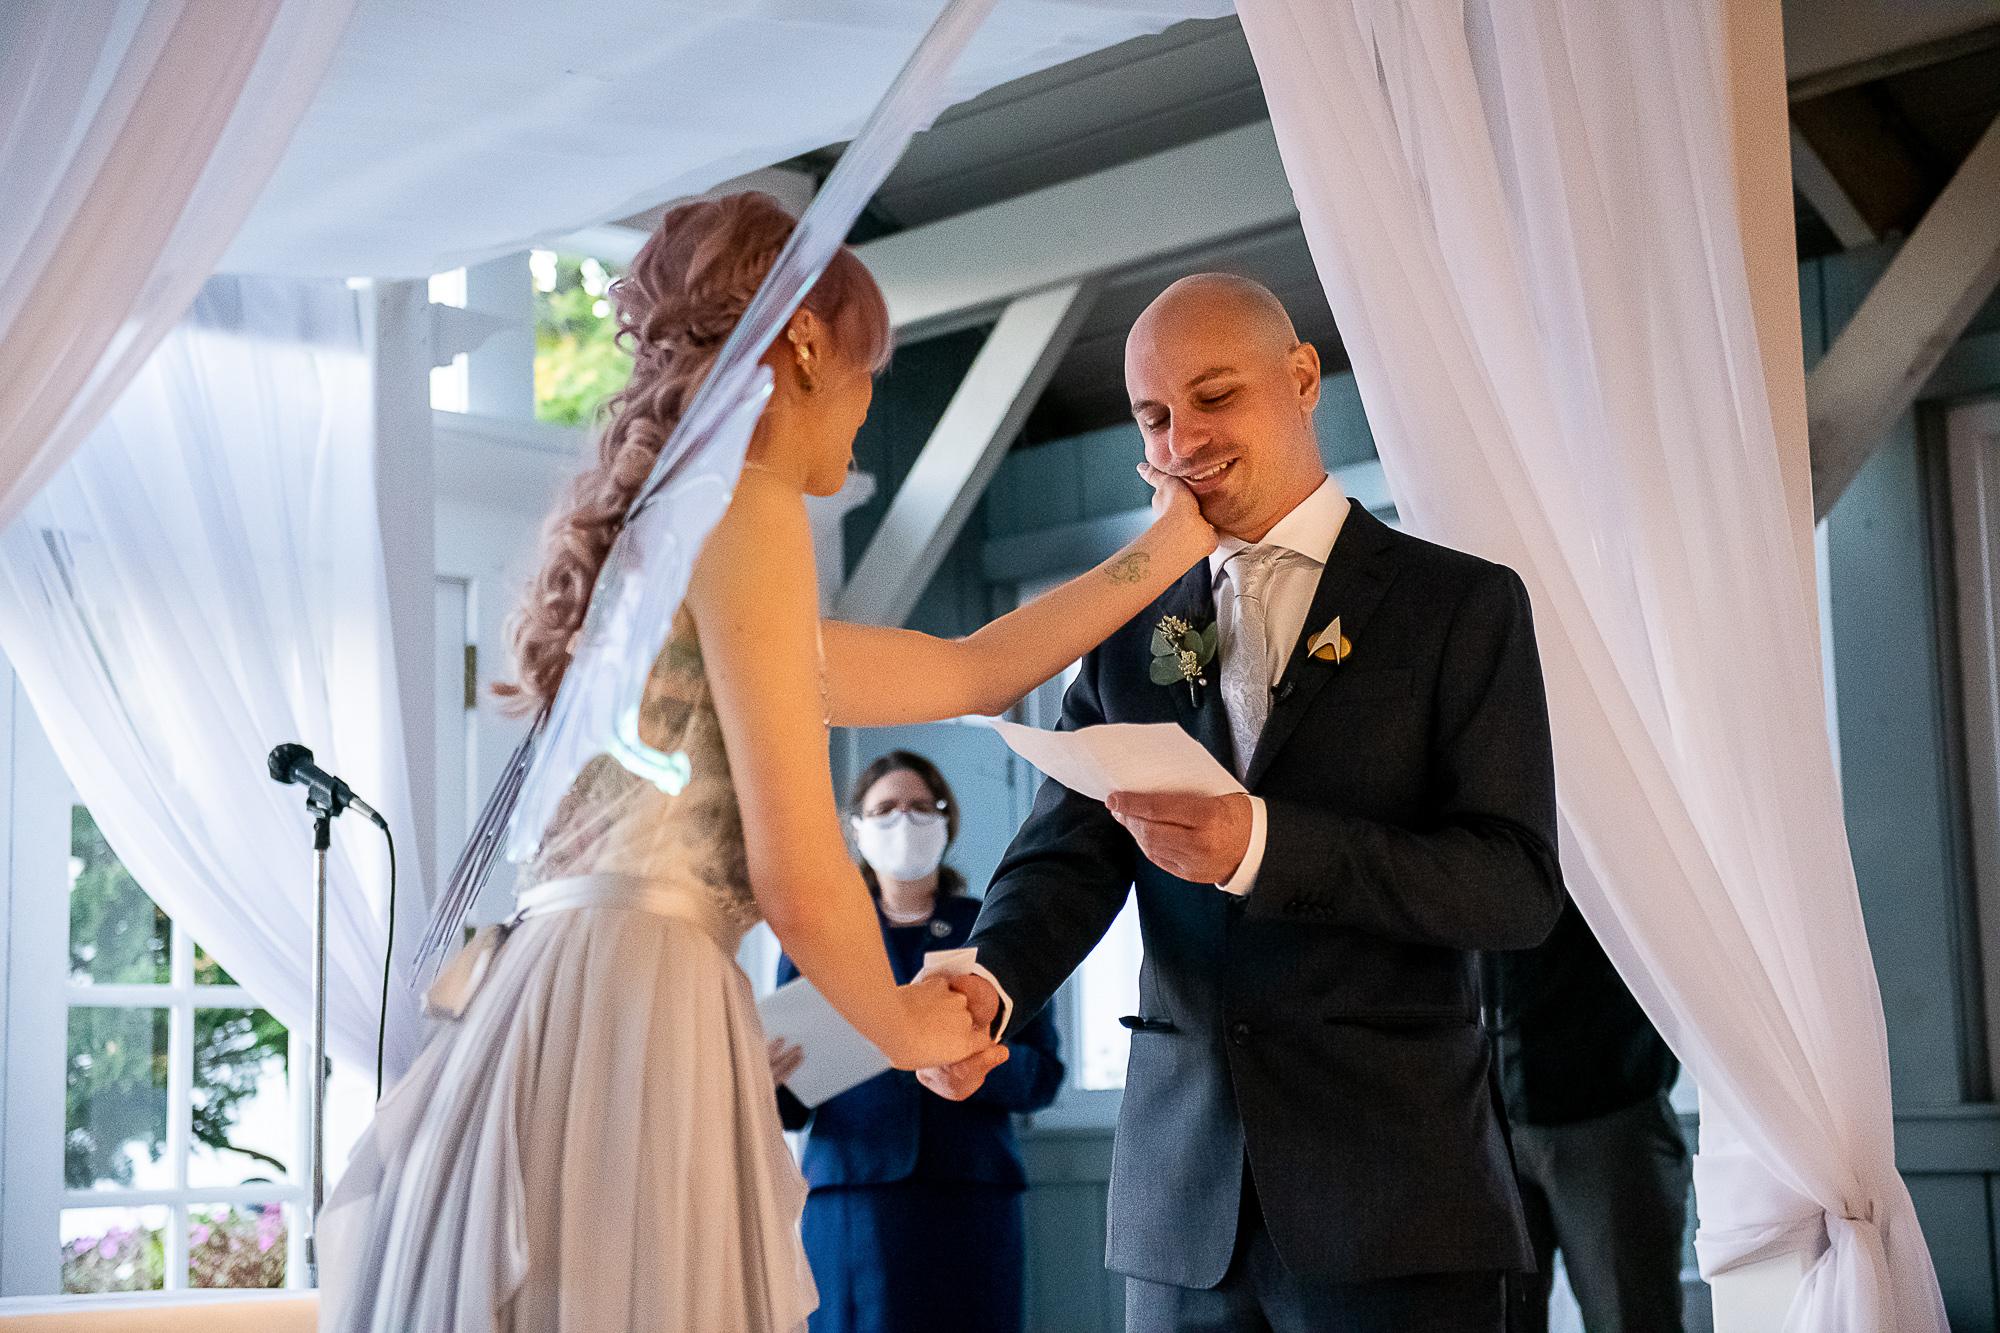 Victoria & Steve's Micro-Wedding at The Swan Club; photos by Christopher Duggan